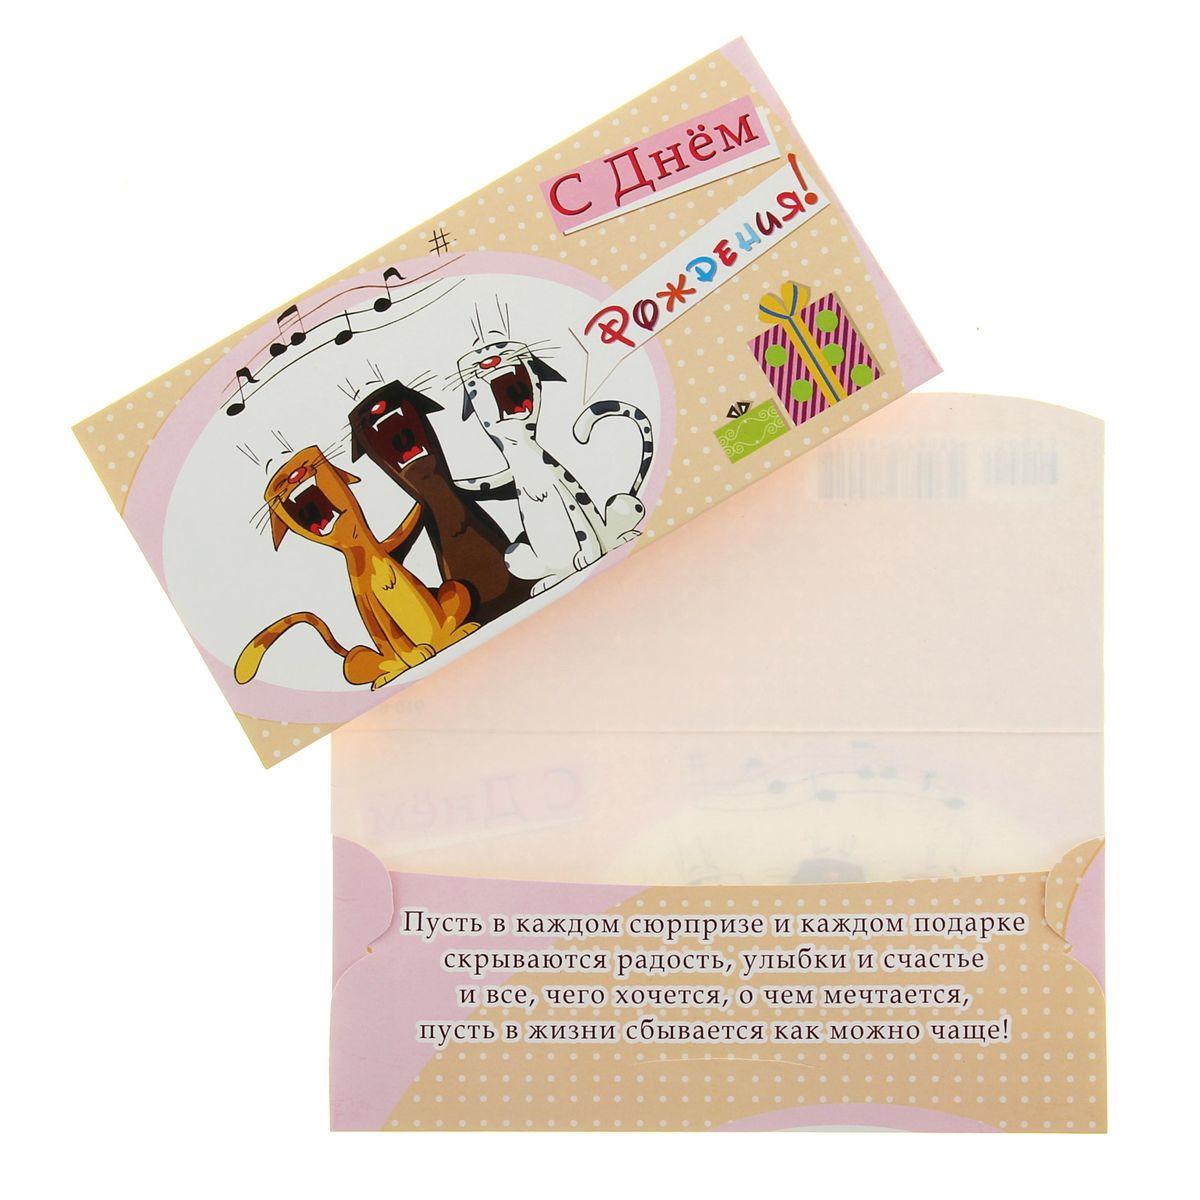 Картинка картинки, конверты с приколами картинки